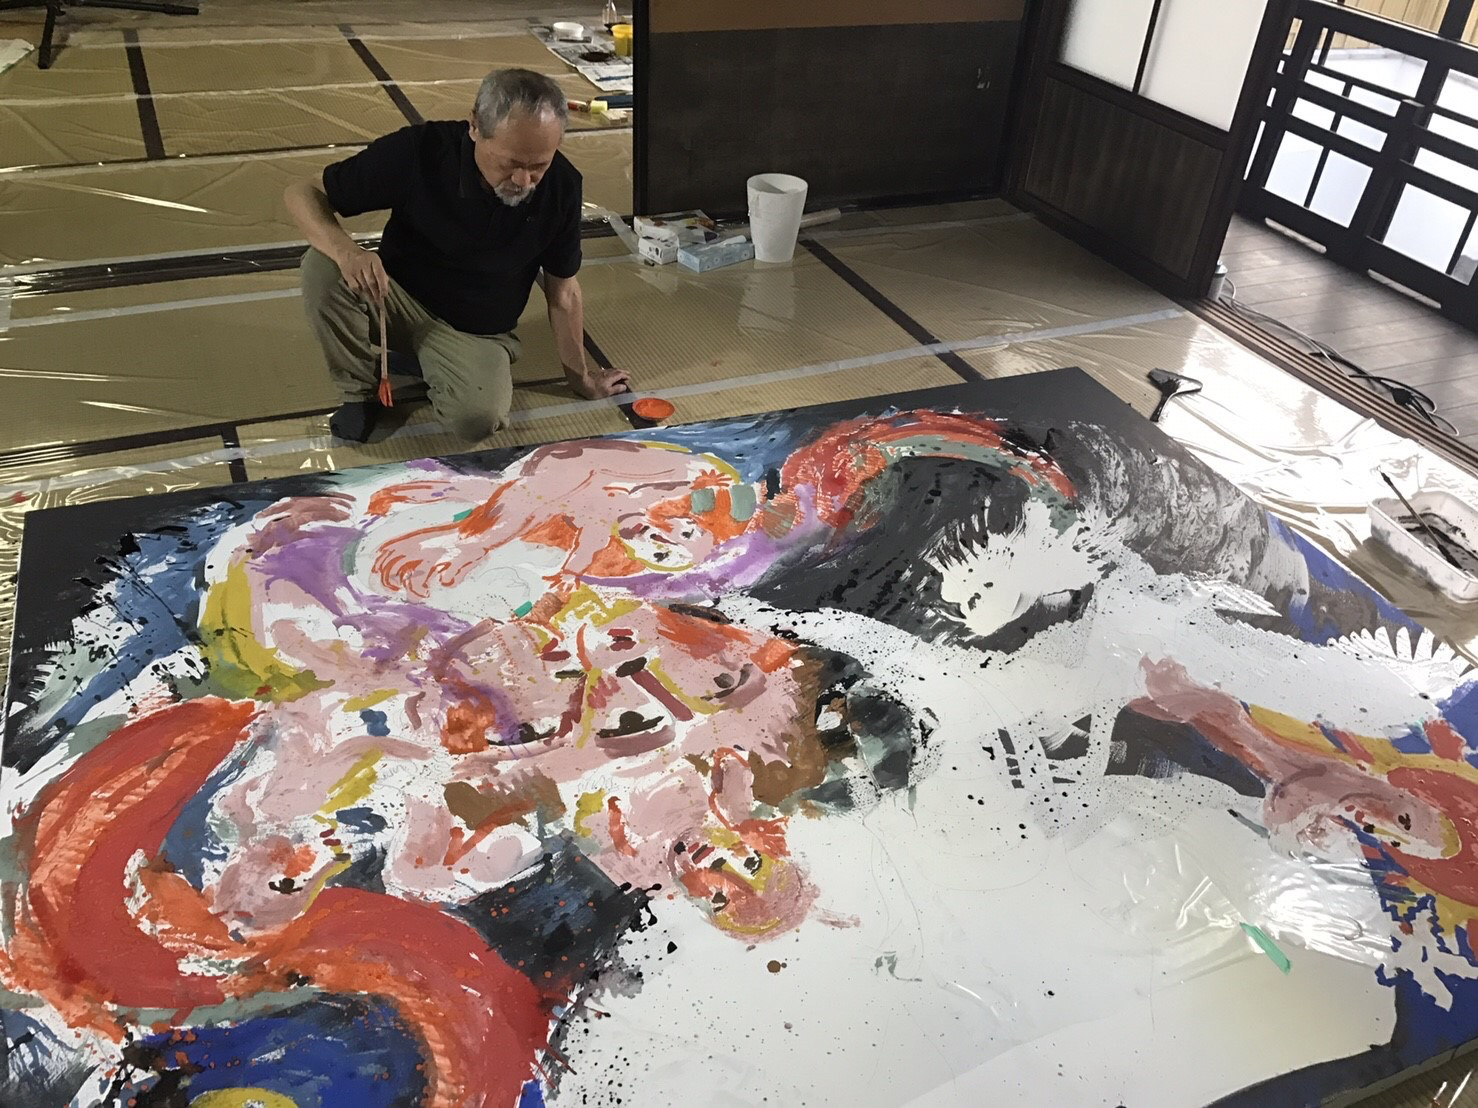 https://kinutani.jp/news/about/2020092601.jpg